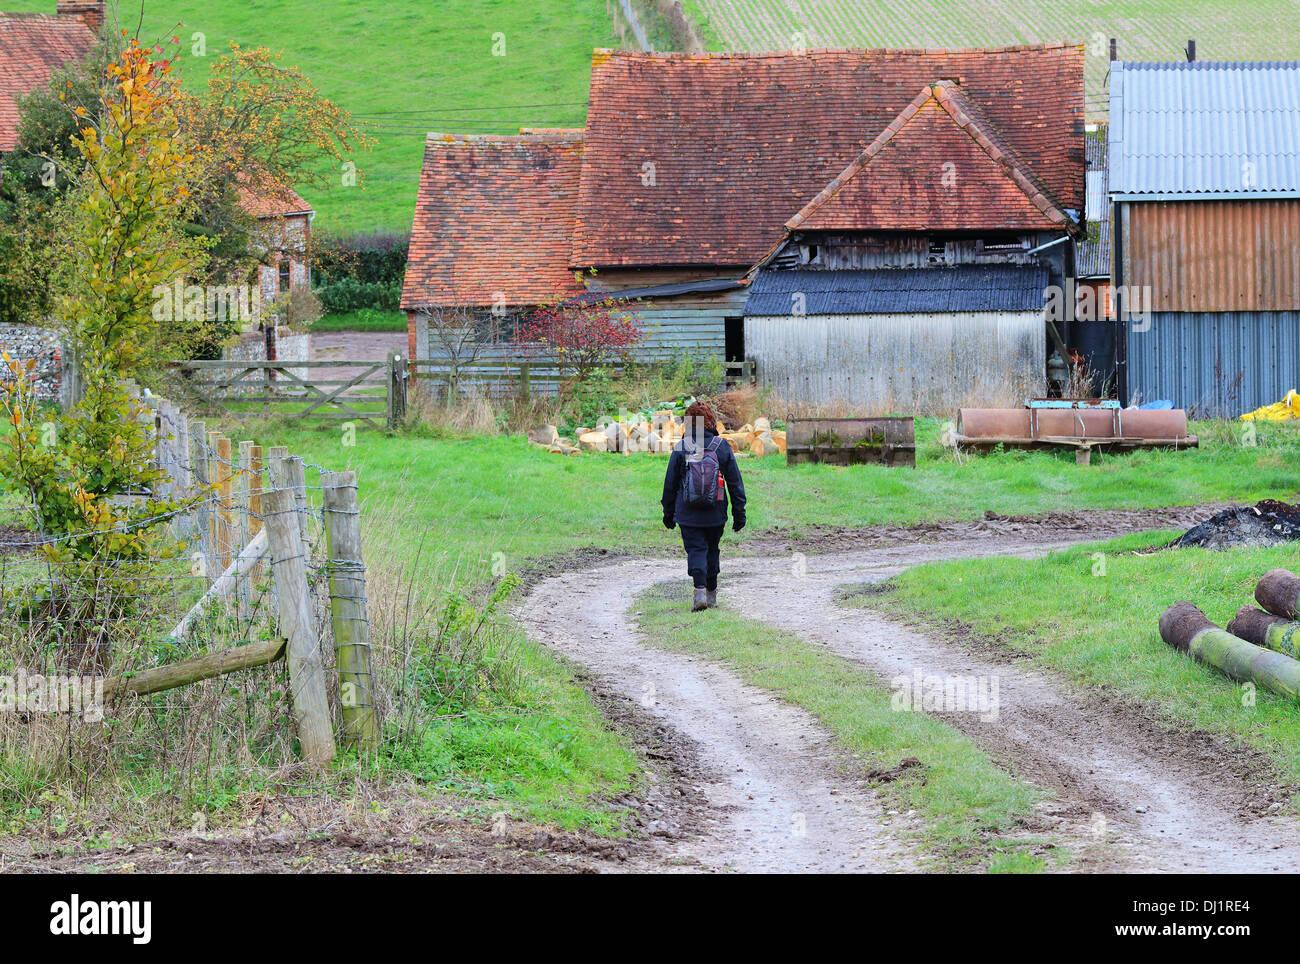 Lady Rambler on an English Rural Track through a Farmyard - Stock Image